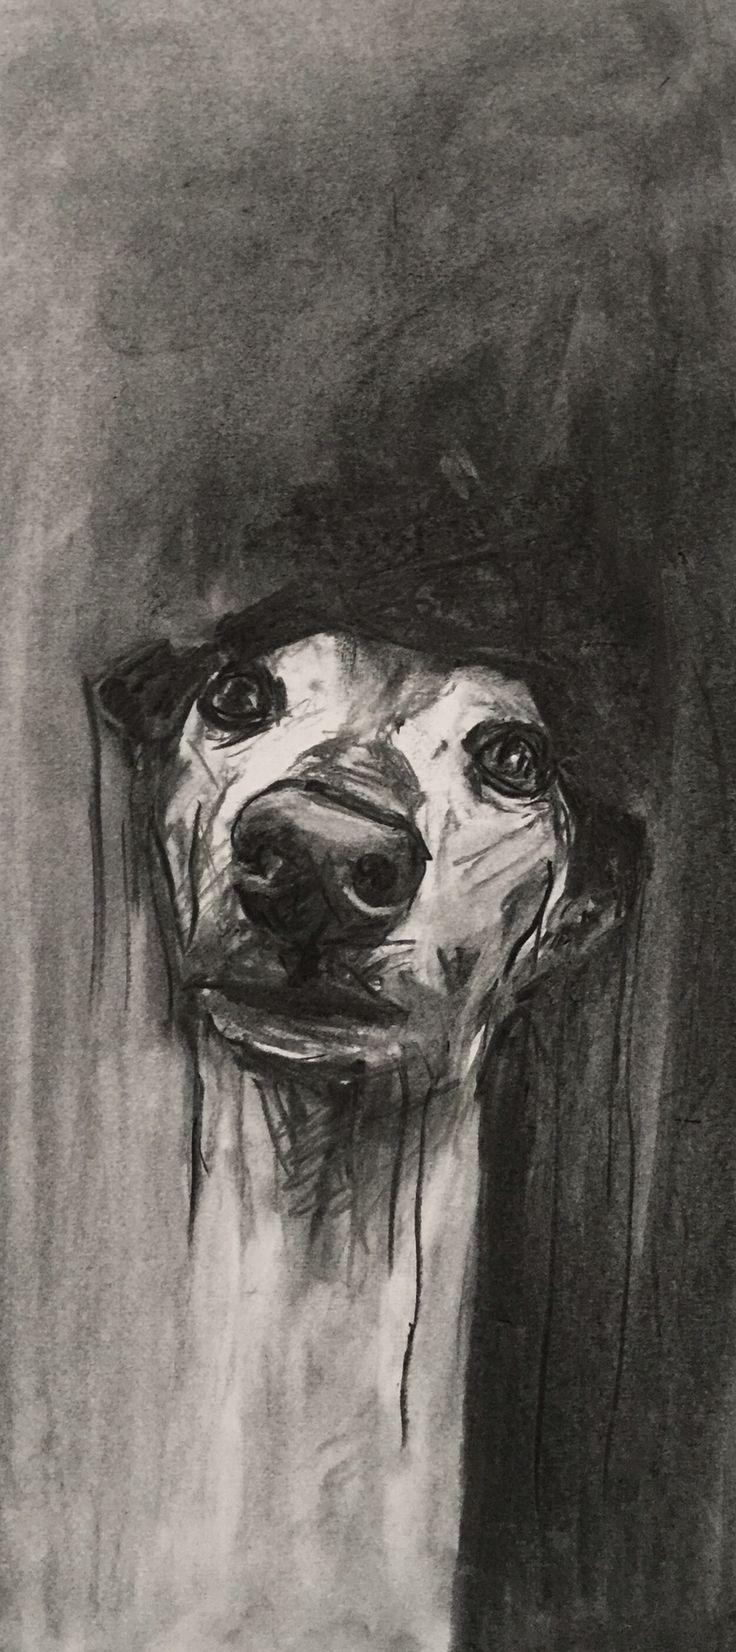 Best 25+ Greyhound Art Ideas On Pinterest | Greyhounds, Italian Pertaining To Italian Greyhound Wall Art (Image 8 of 20)